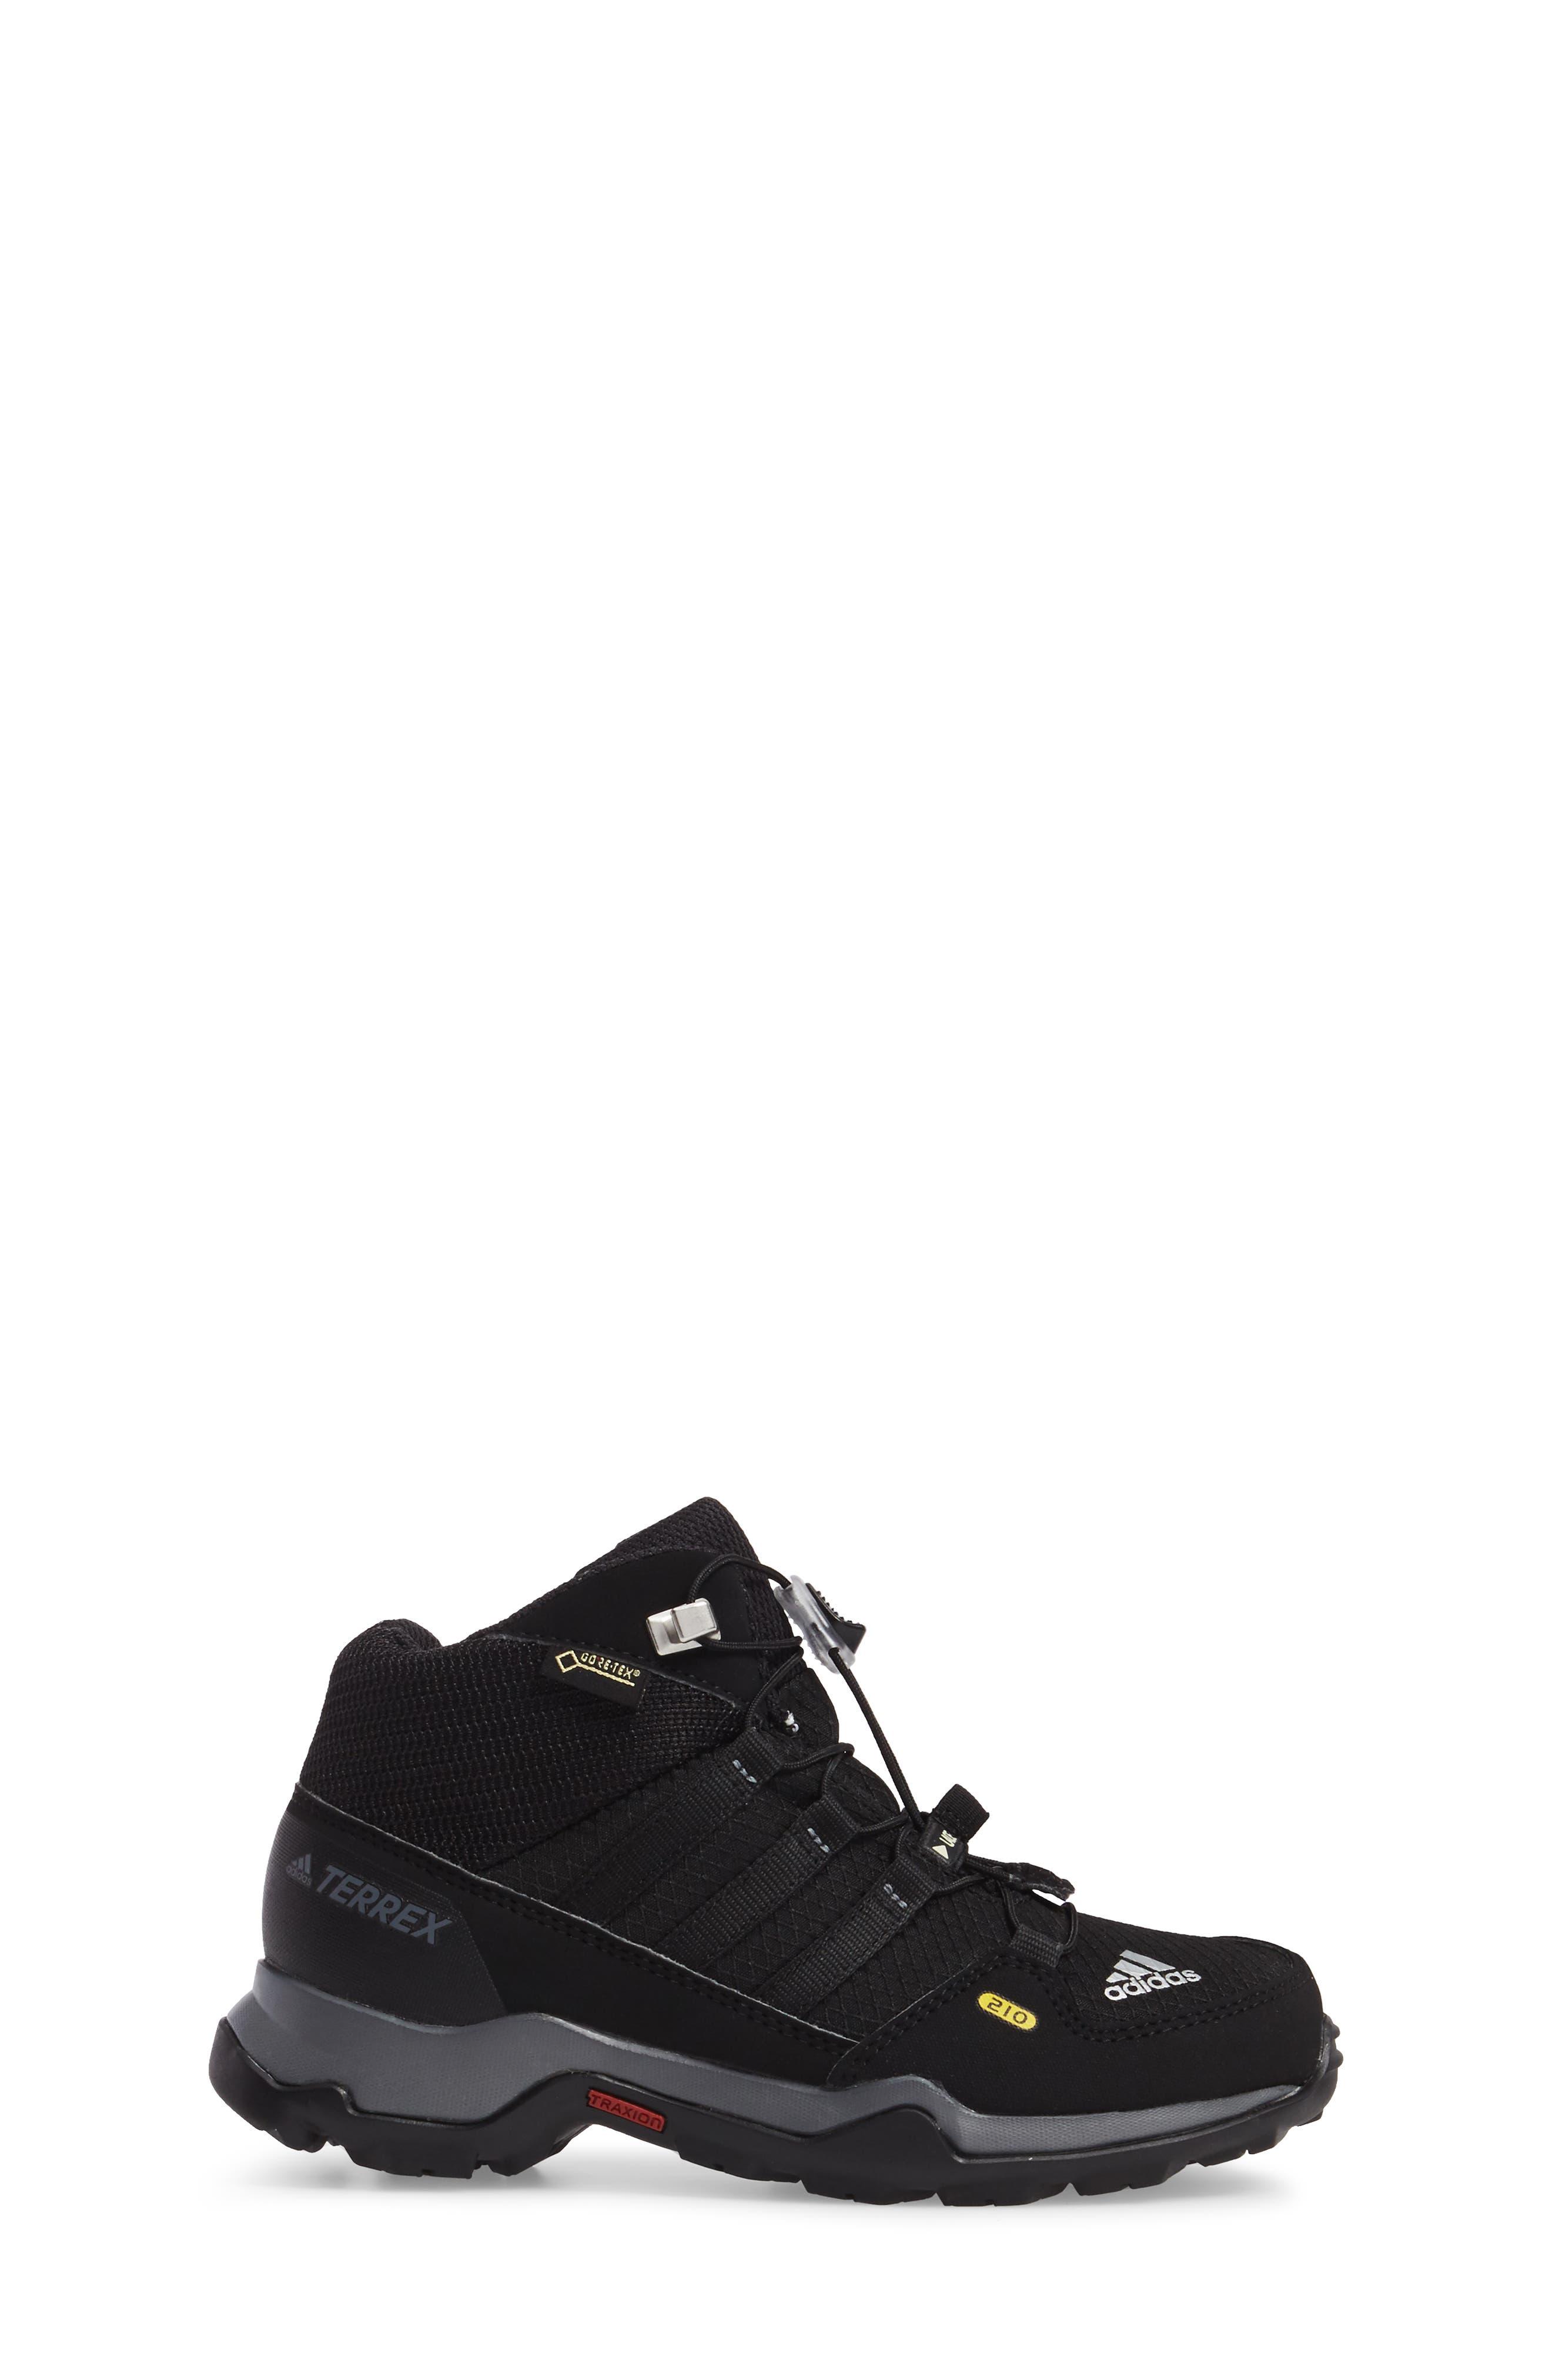 Terrex Mid Gore-Tex<sup>®</sup> Insulated Waterproof Sneaker Boot,                             Alternate thumbnail 3, color,                             Black/ Black/ Vista Grey